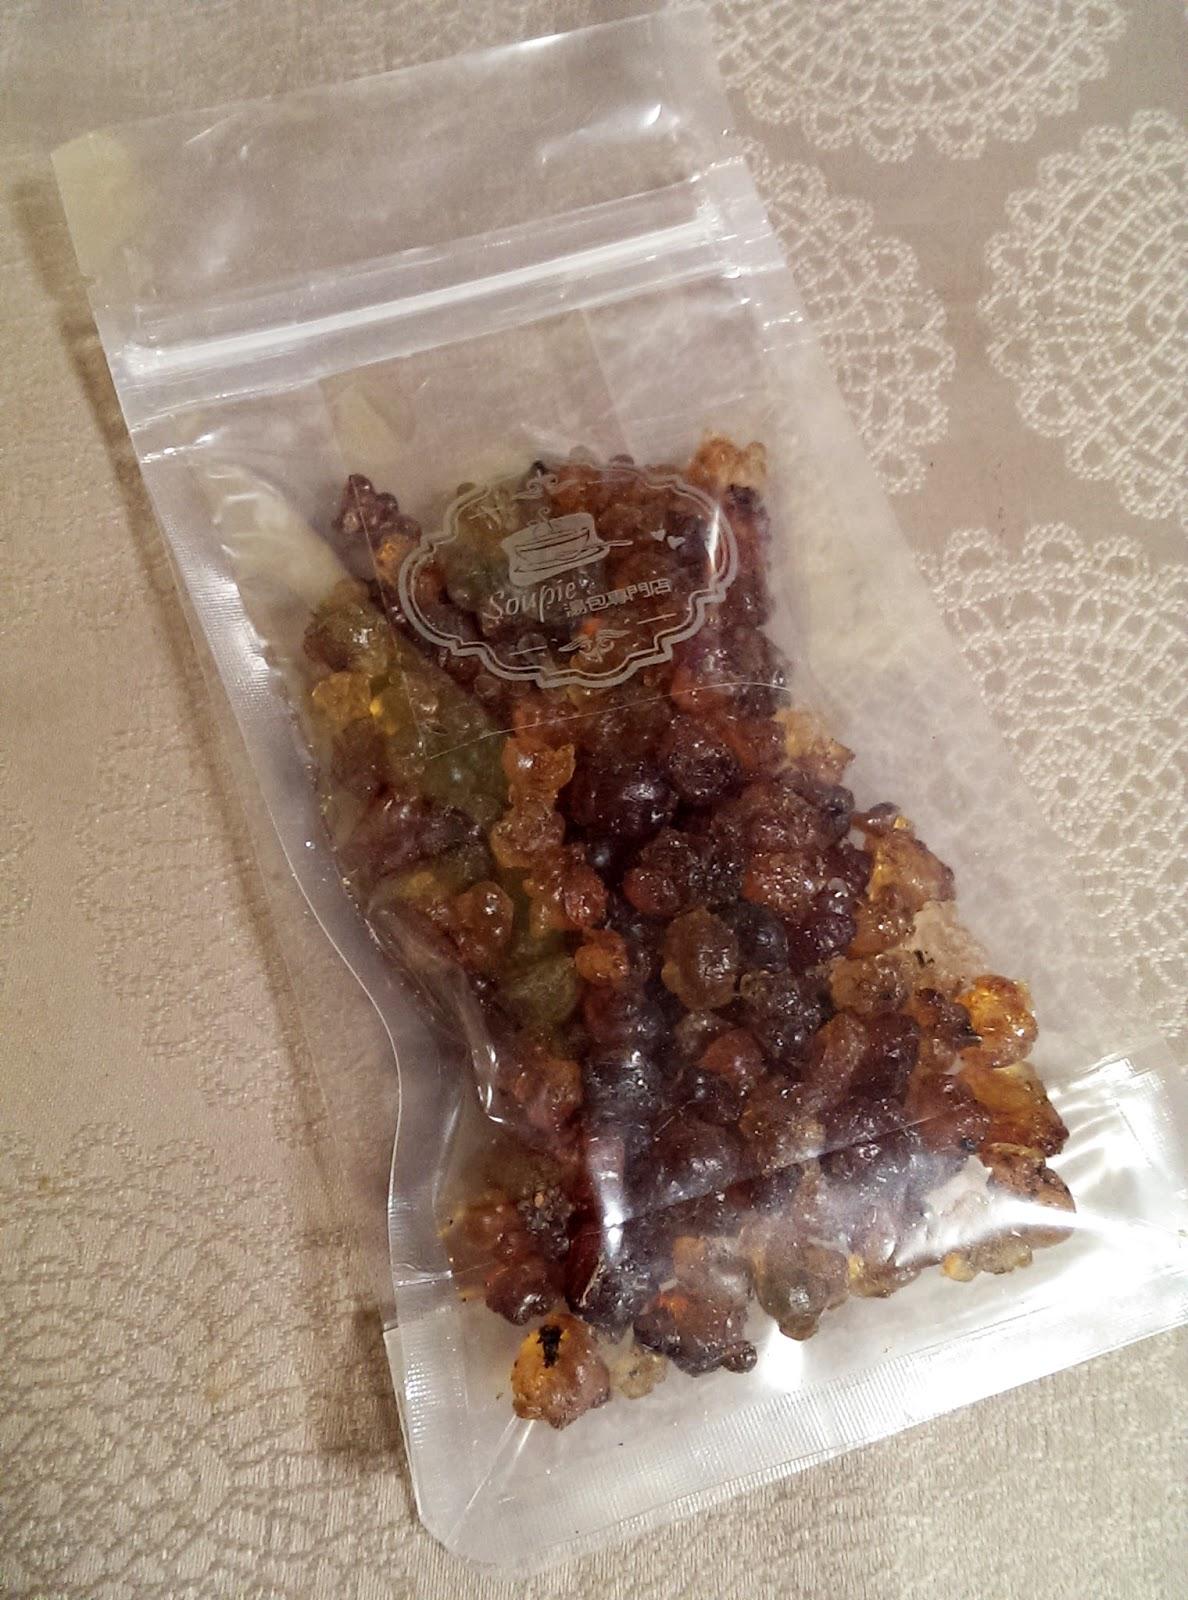 V. Cristo 素阿圖: 被喻為「平民燕窩」的桃膠